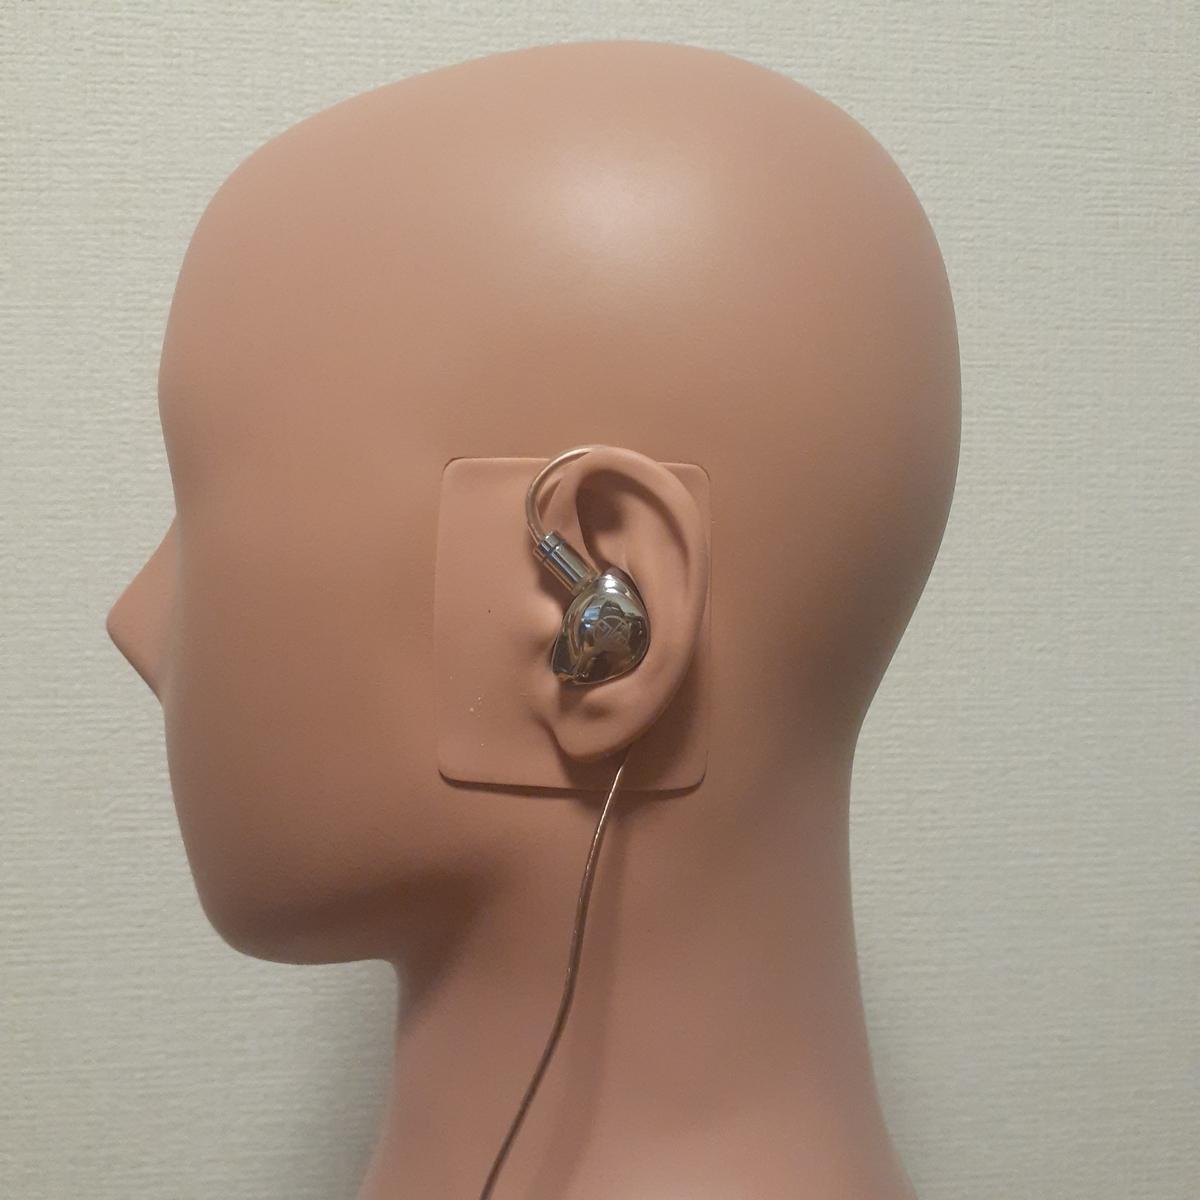 Audiosense DT300